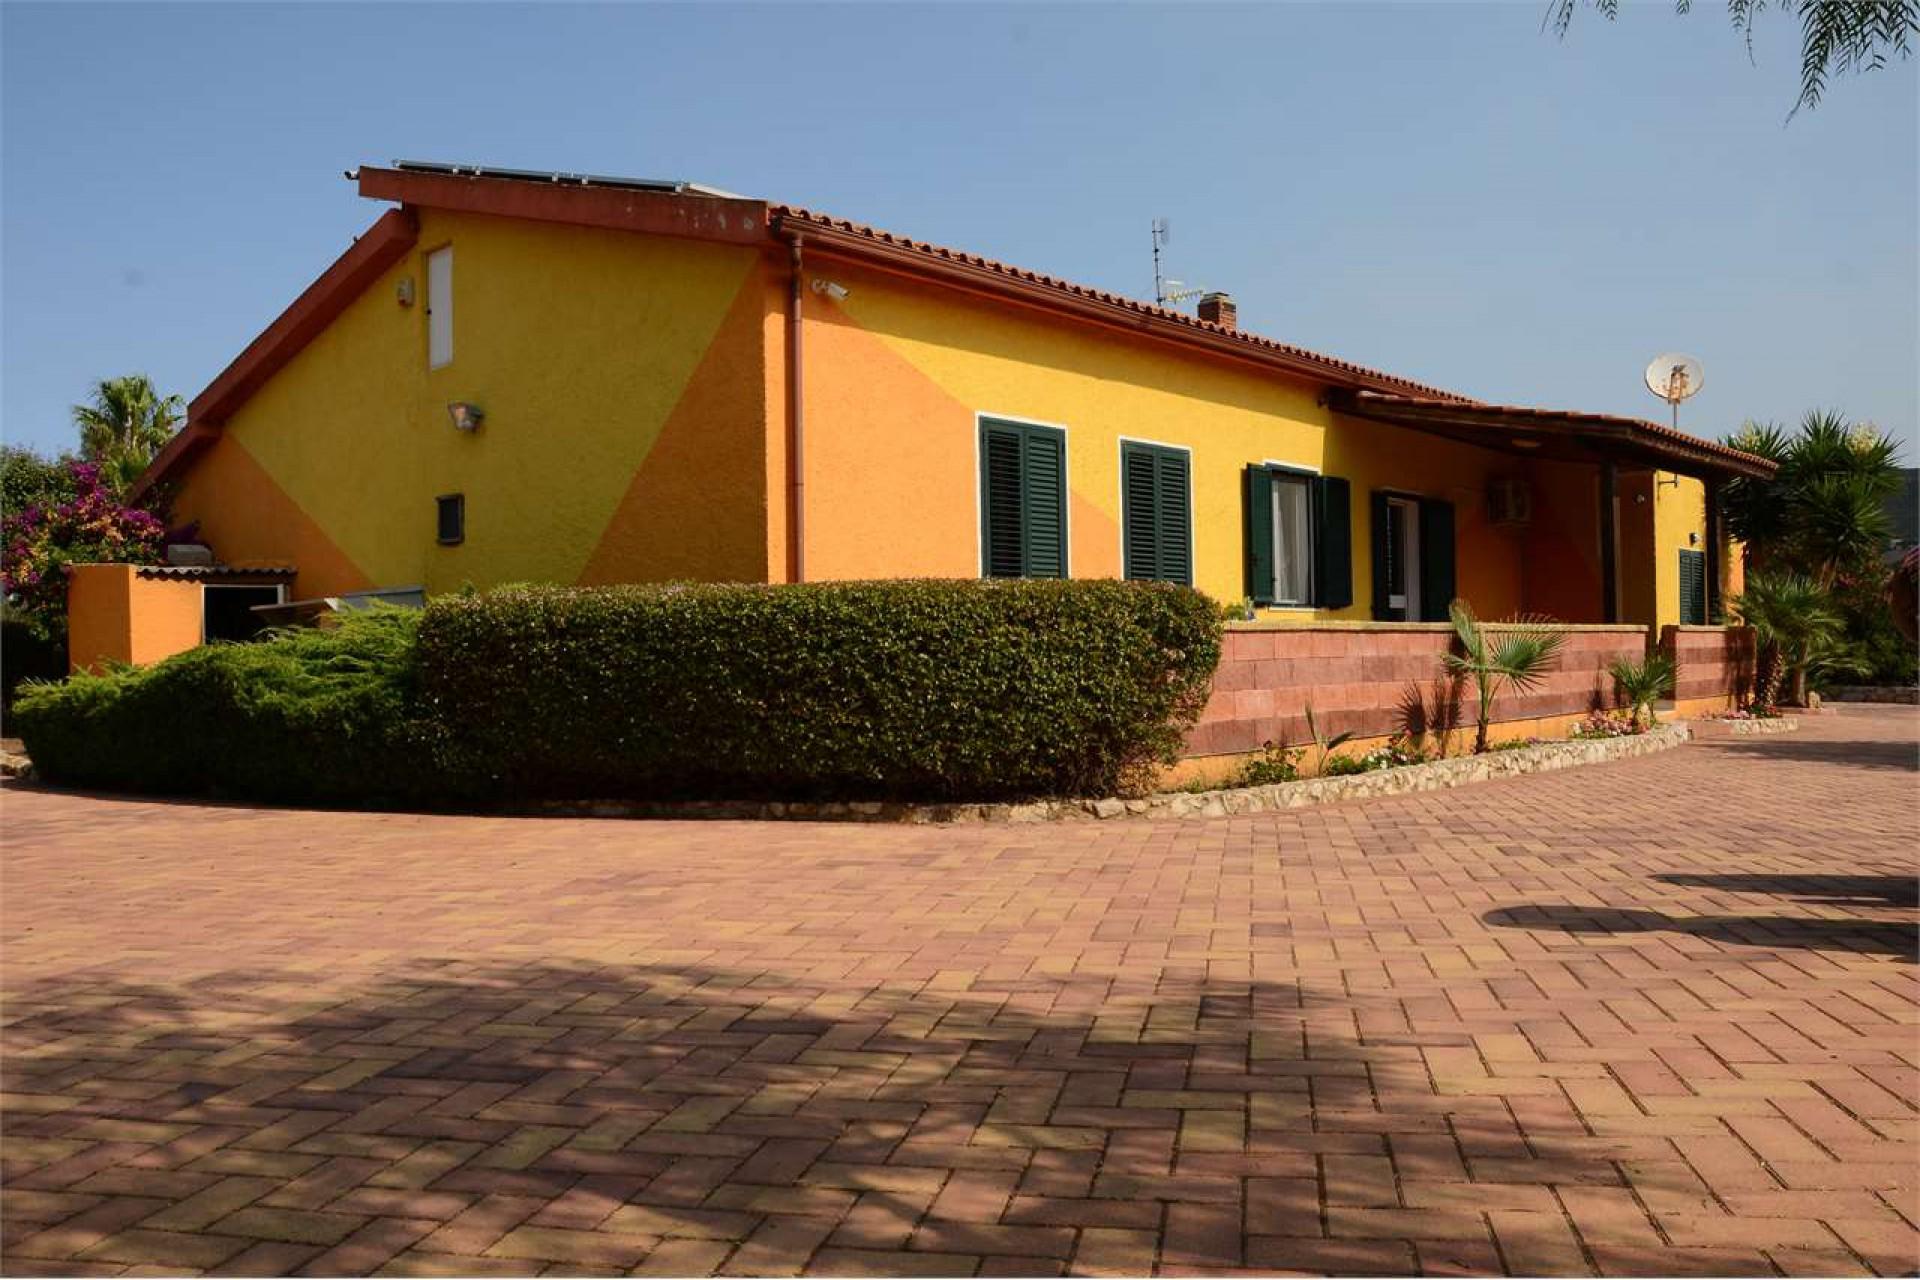 Alghero  villas and swimming pool